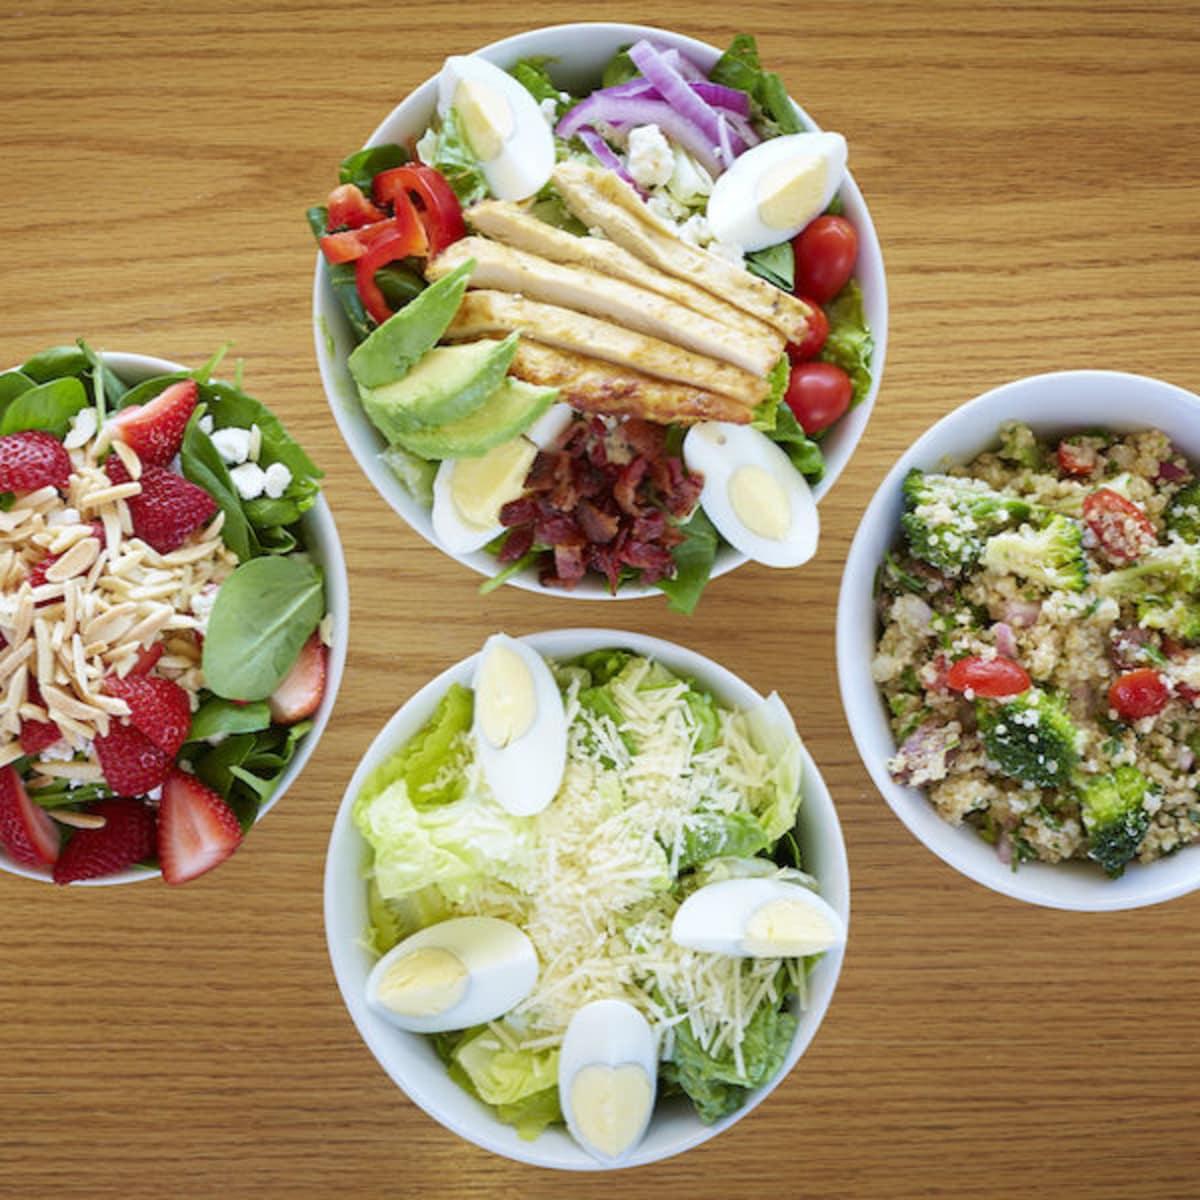 Lyfe Kitchen Nutrition: A Critic's Breakdown Of Dallas' New Crop Of Healthy